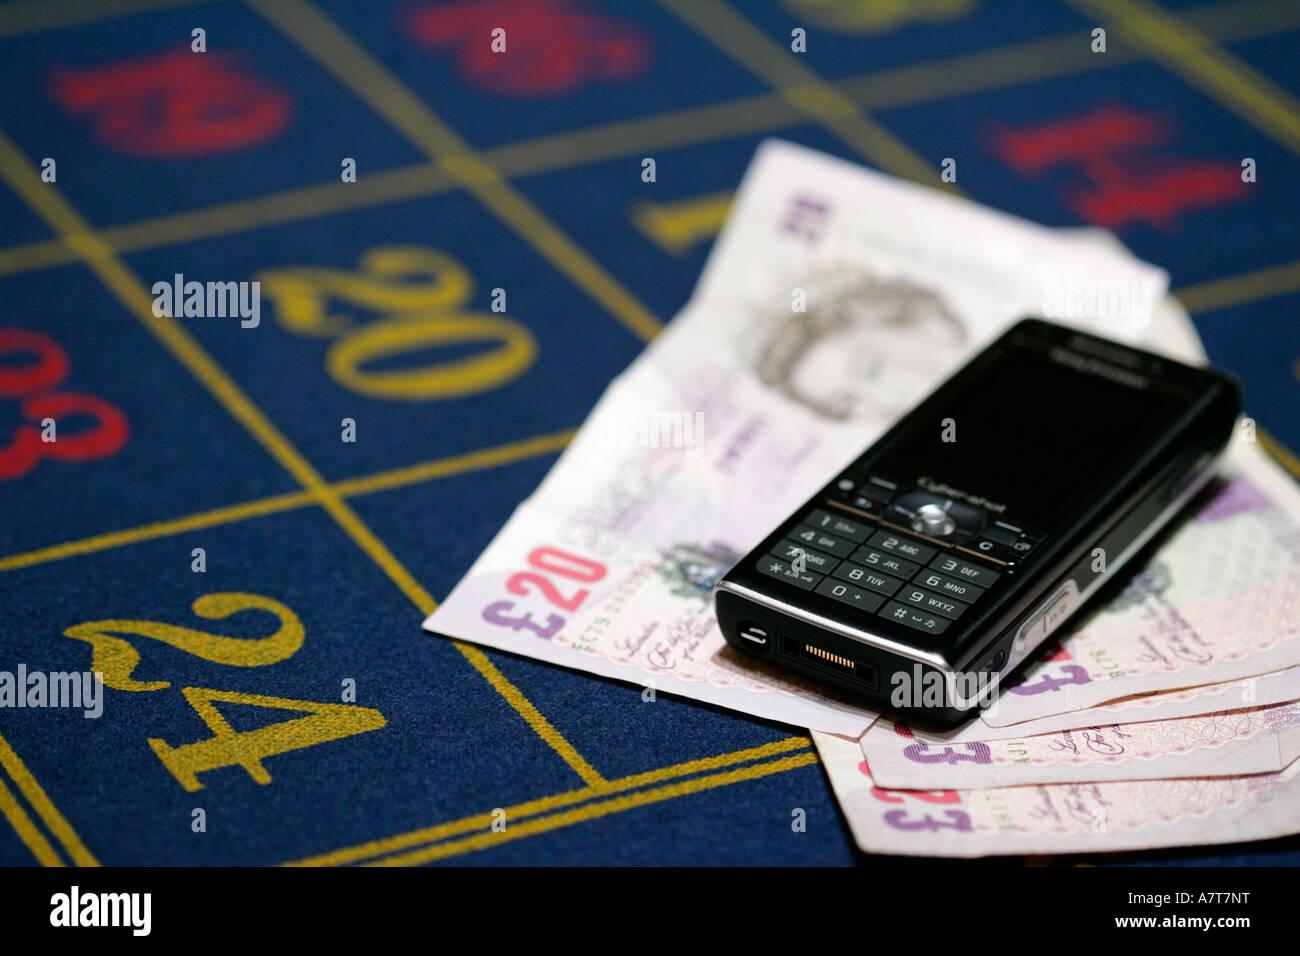 Casino telephone virgin river hotel casino promo code